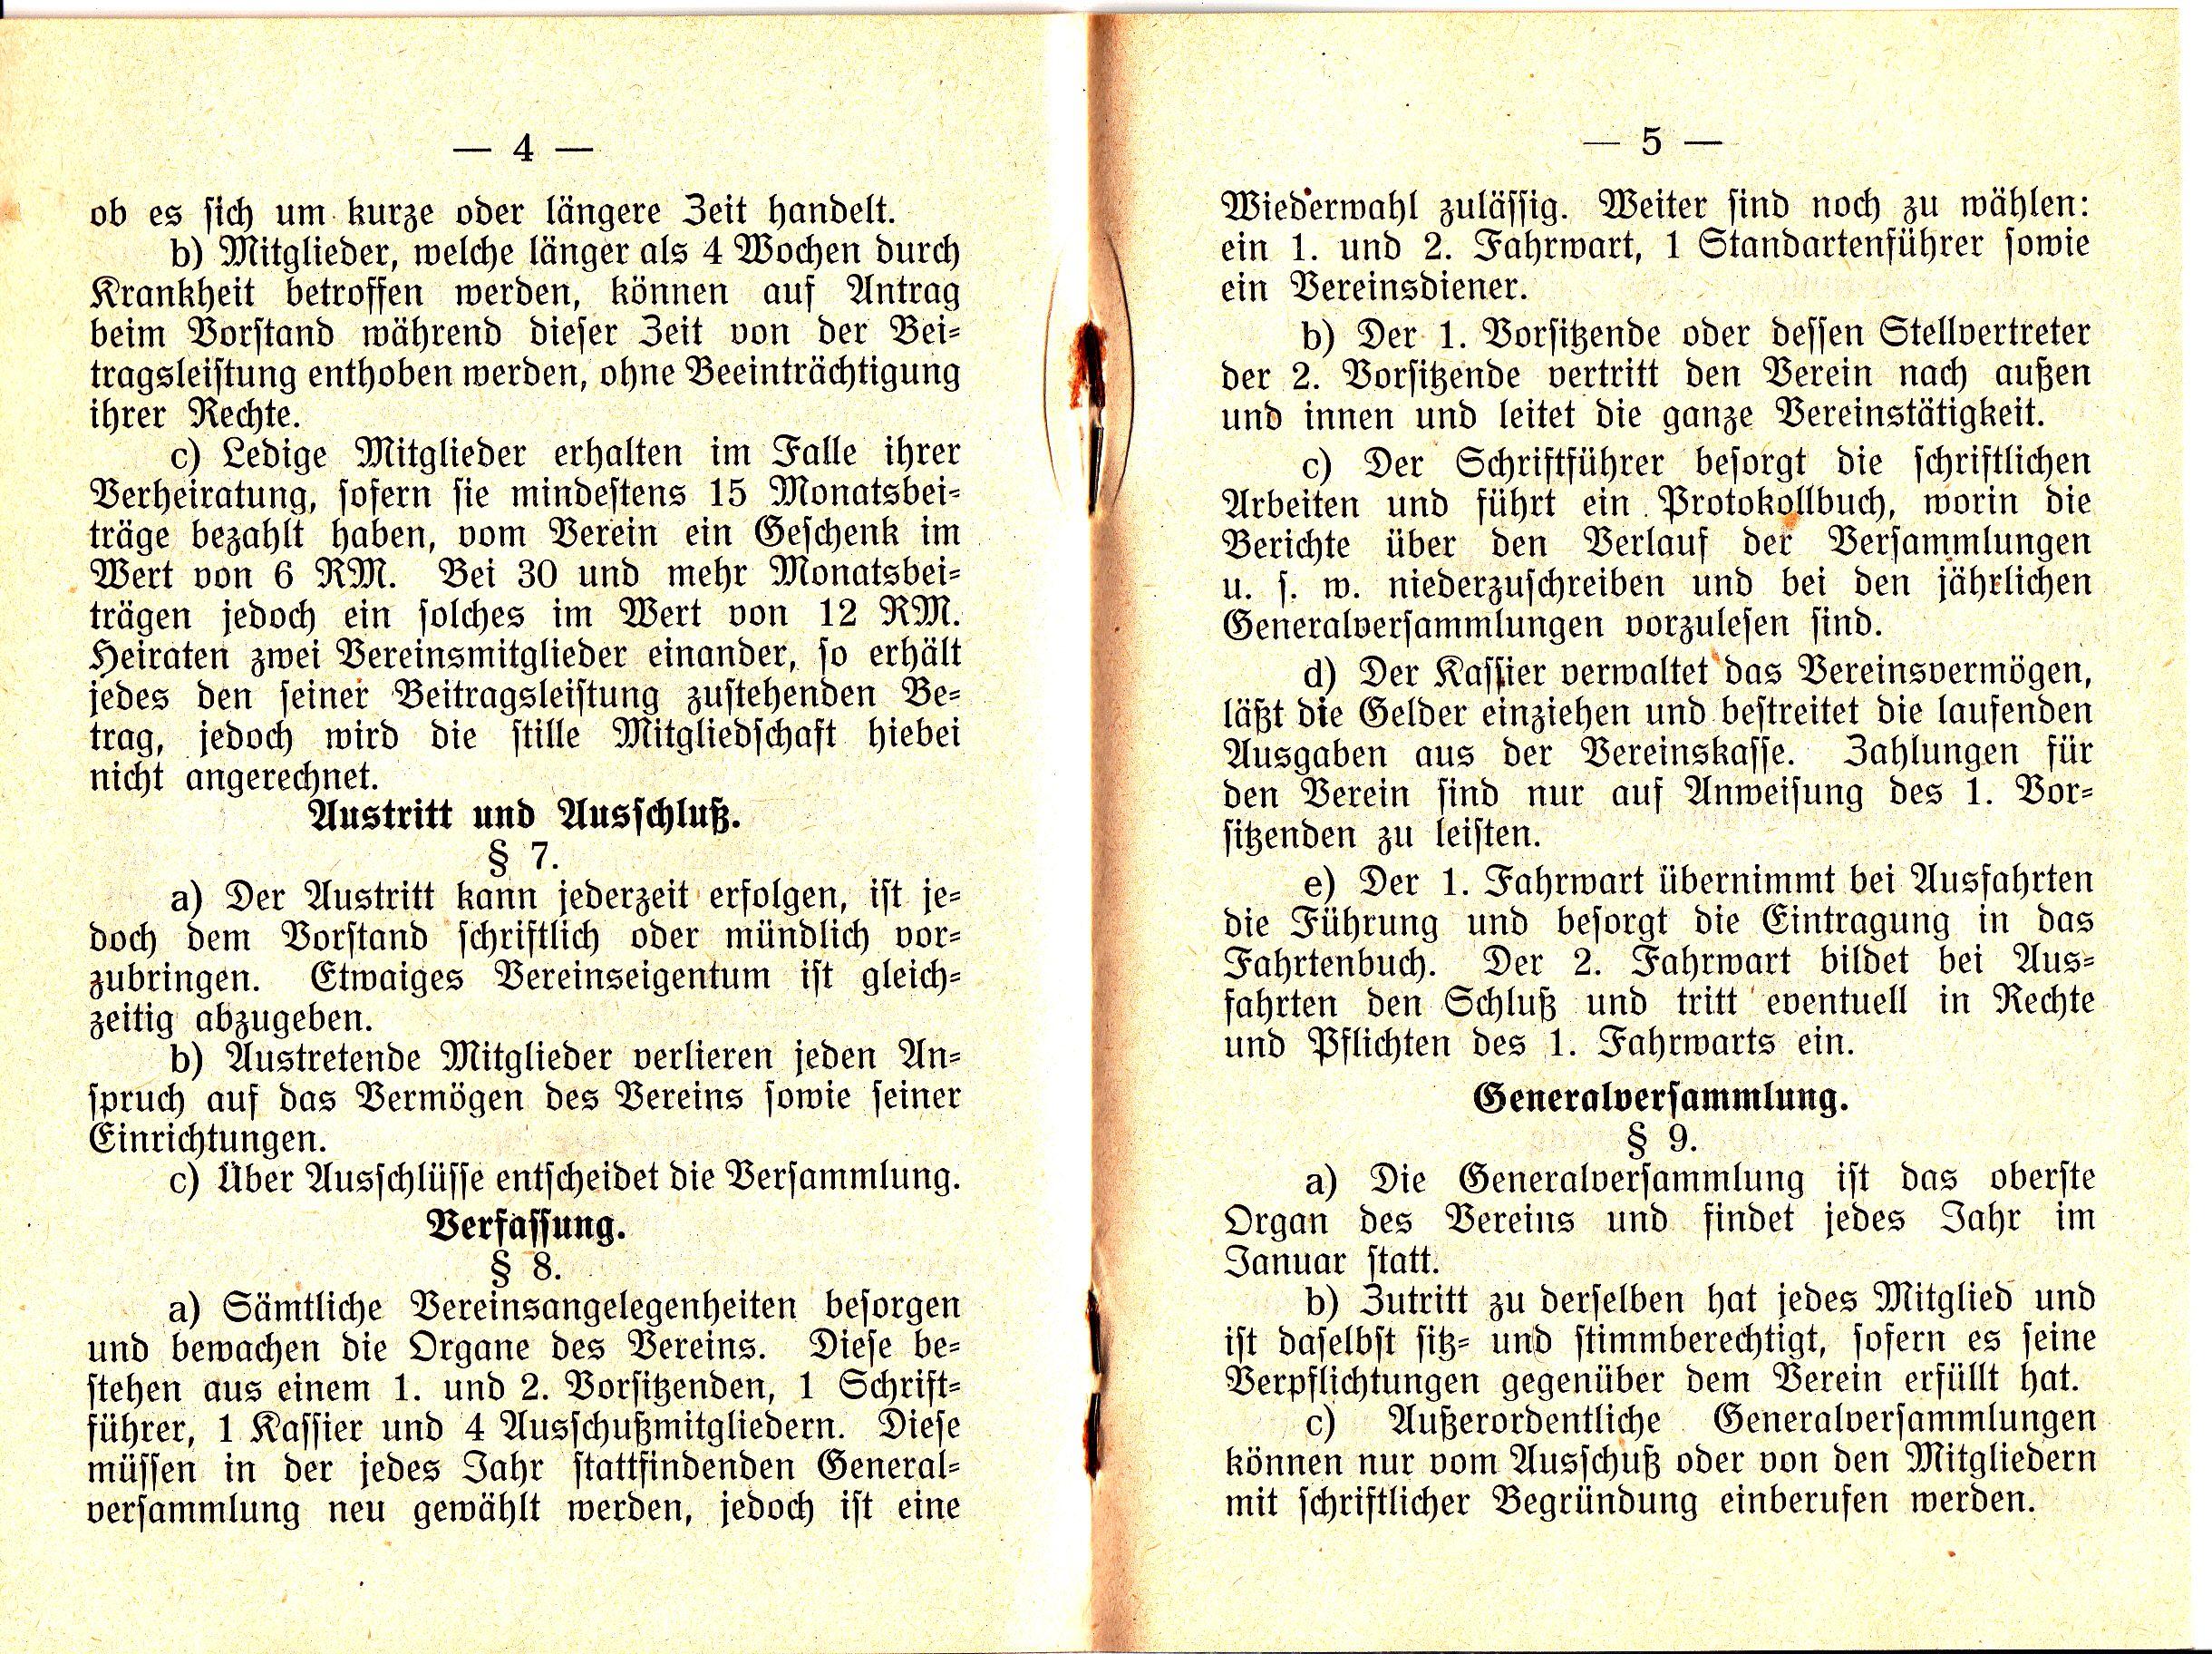 Austritt u. Ausschluß, Verfassung, Generalversammlung